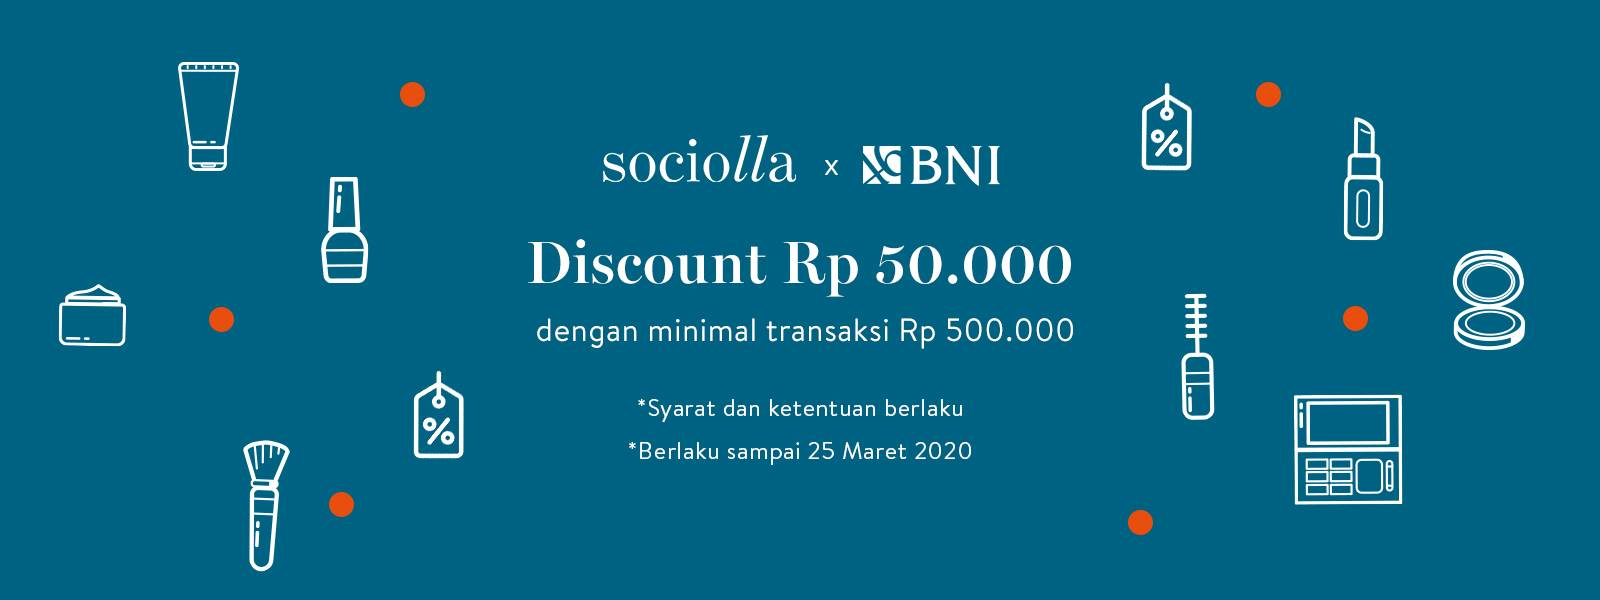 Sociolla Promo Voucher Diskon Rp. 50.000 Dengan Kartu Kredit BNI